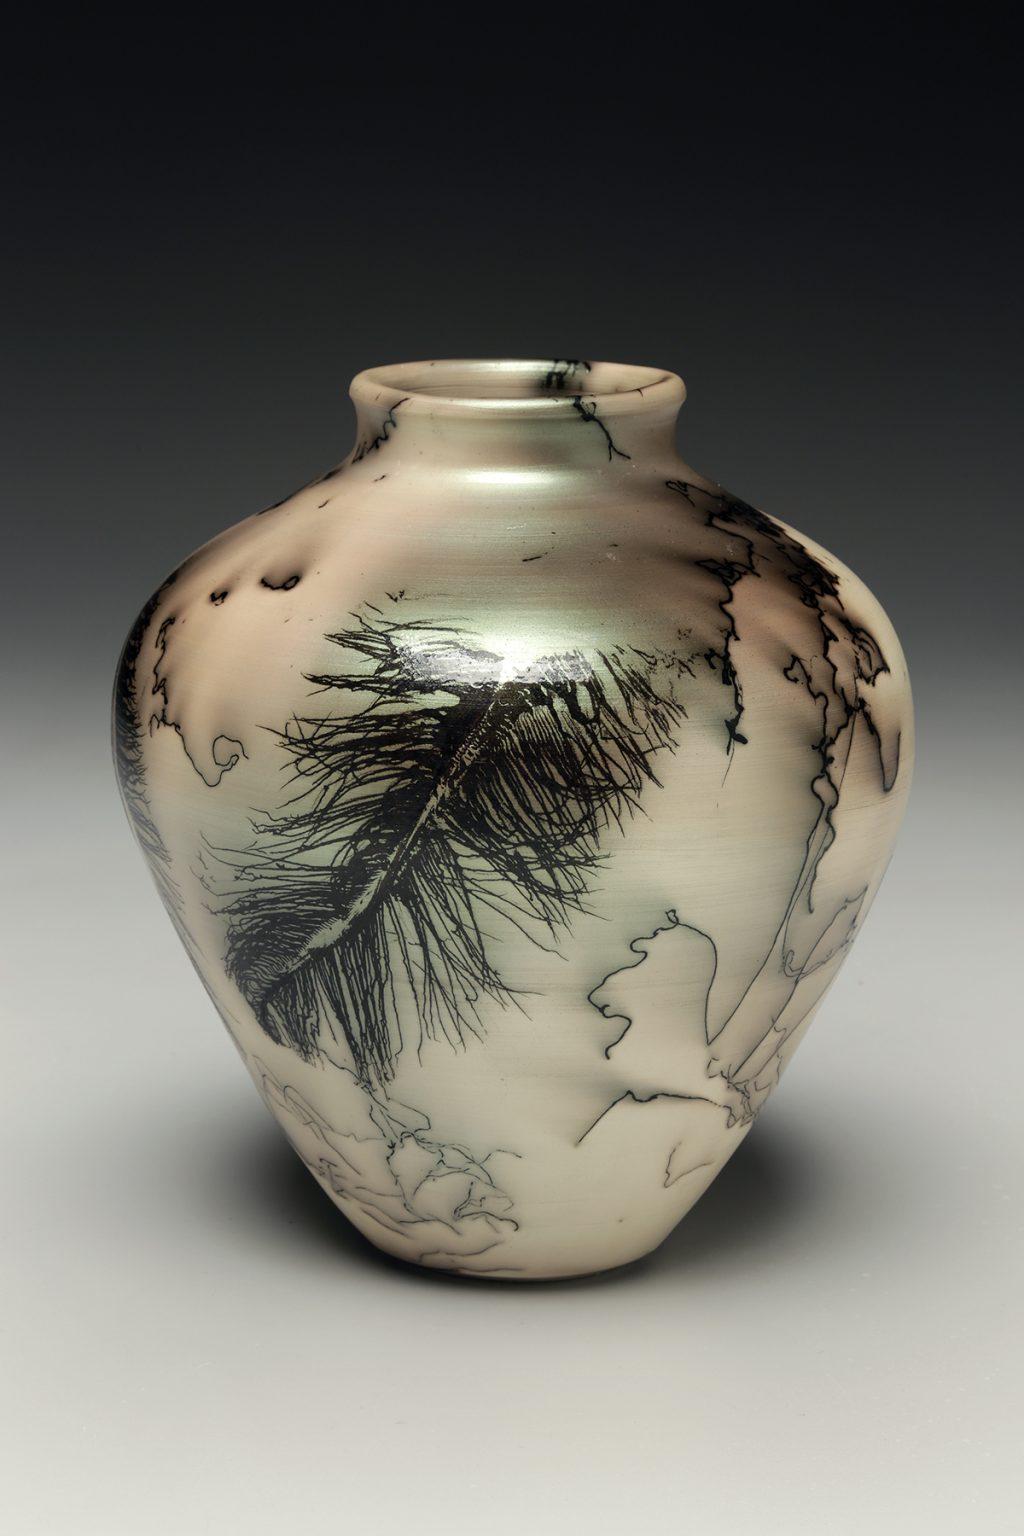 Judi Harwood, the Village Potters Clay Center, Asheville, NC, Raku, Horsehair